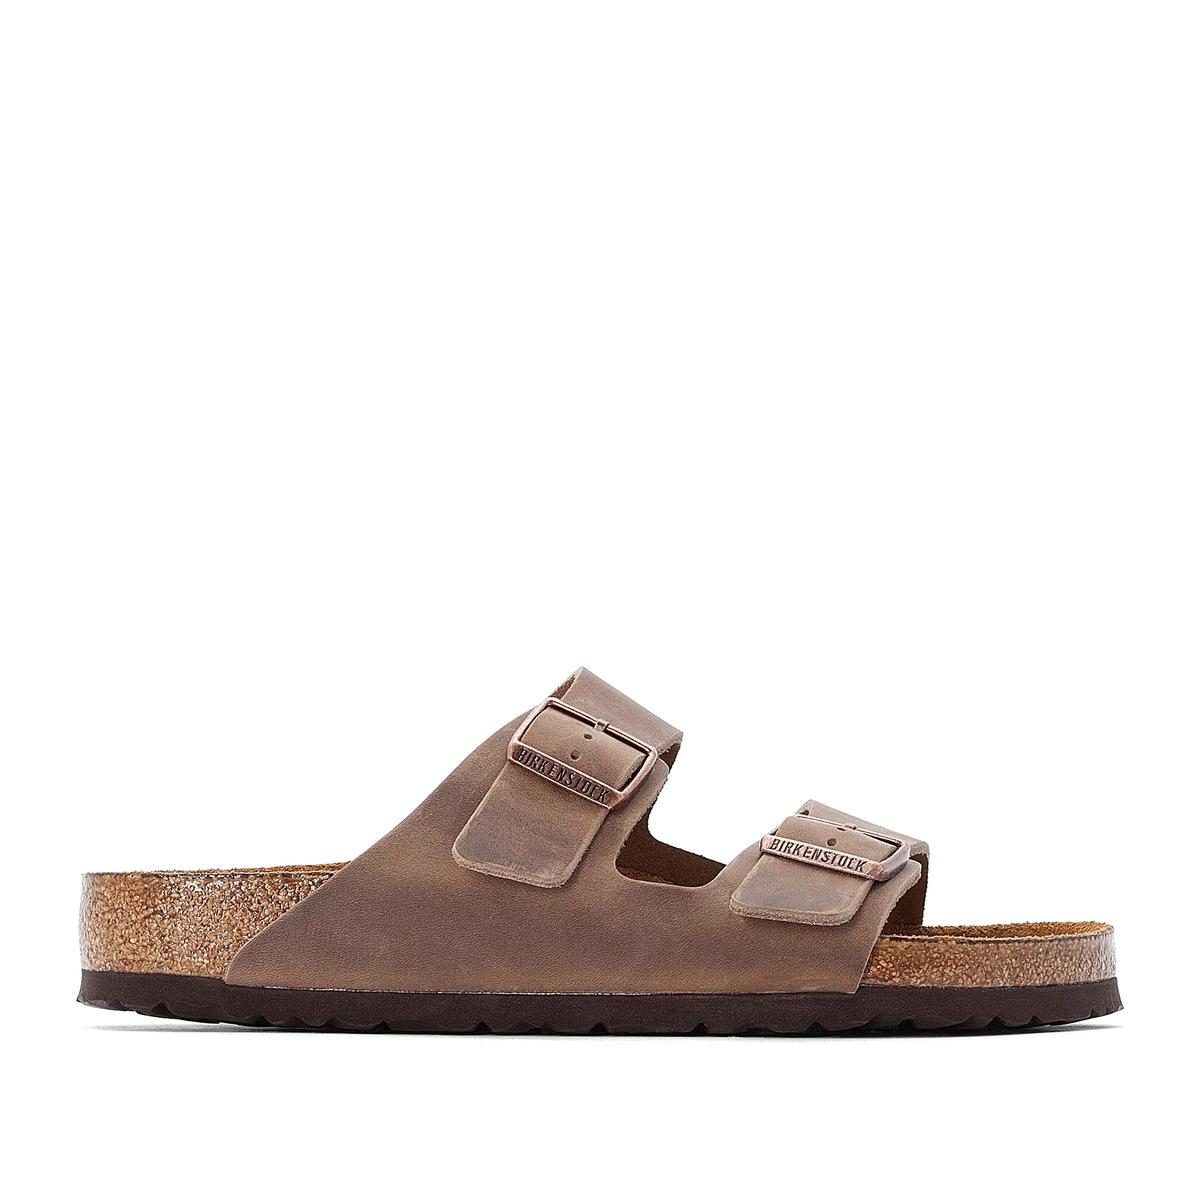 Туфли La Redoute Без задника из кожи Arizona 41 каштановый туфли без задника кожаные с блестящими деталями